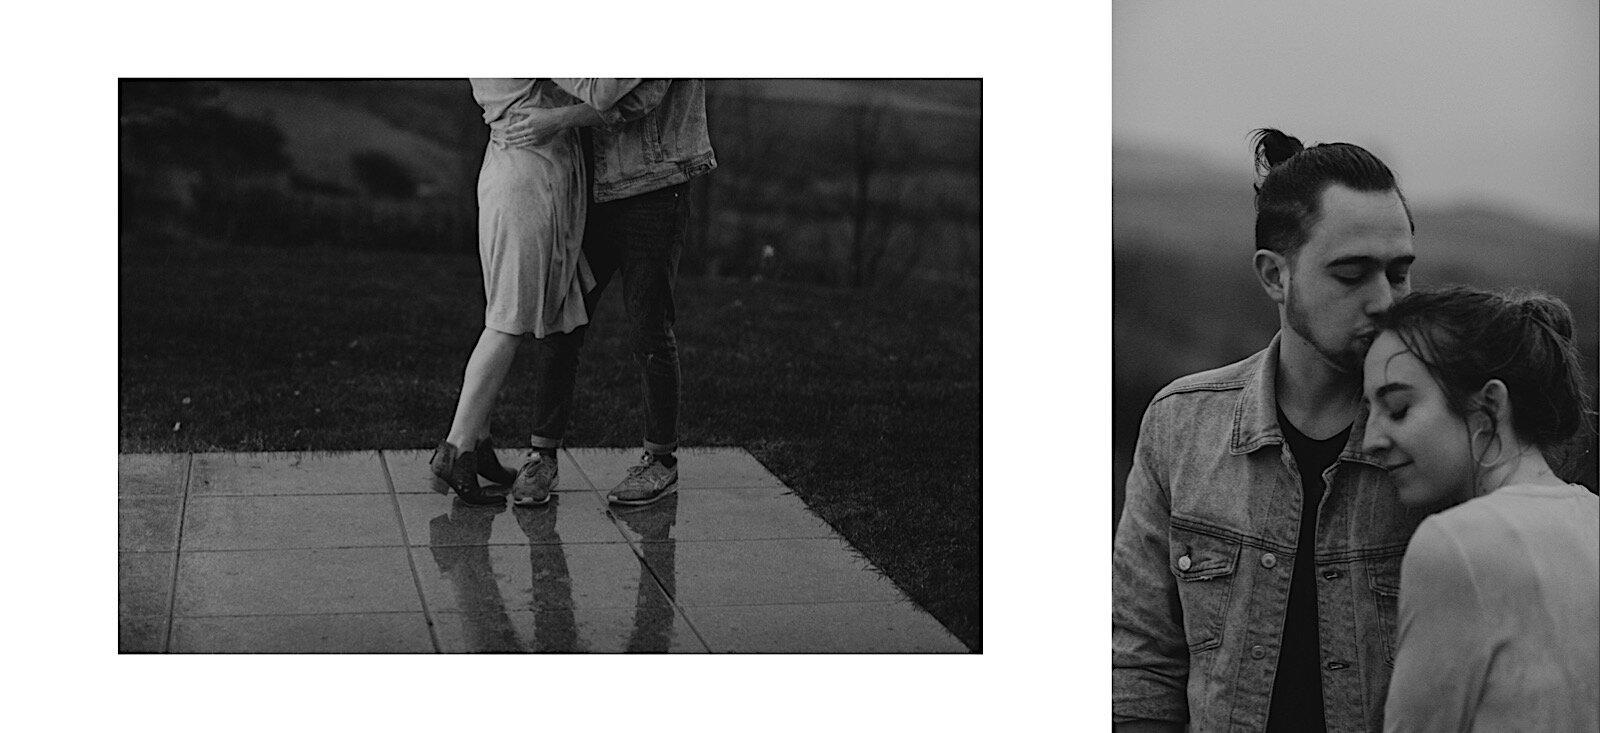 18_scotland_couple_shoot_lety_photography (33 von 36)_scotland_couple_shoot_lety_photography (32 von 36).jpg